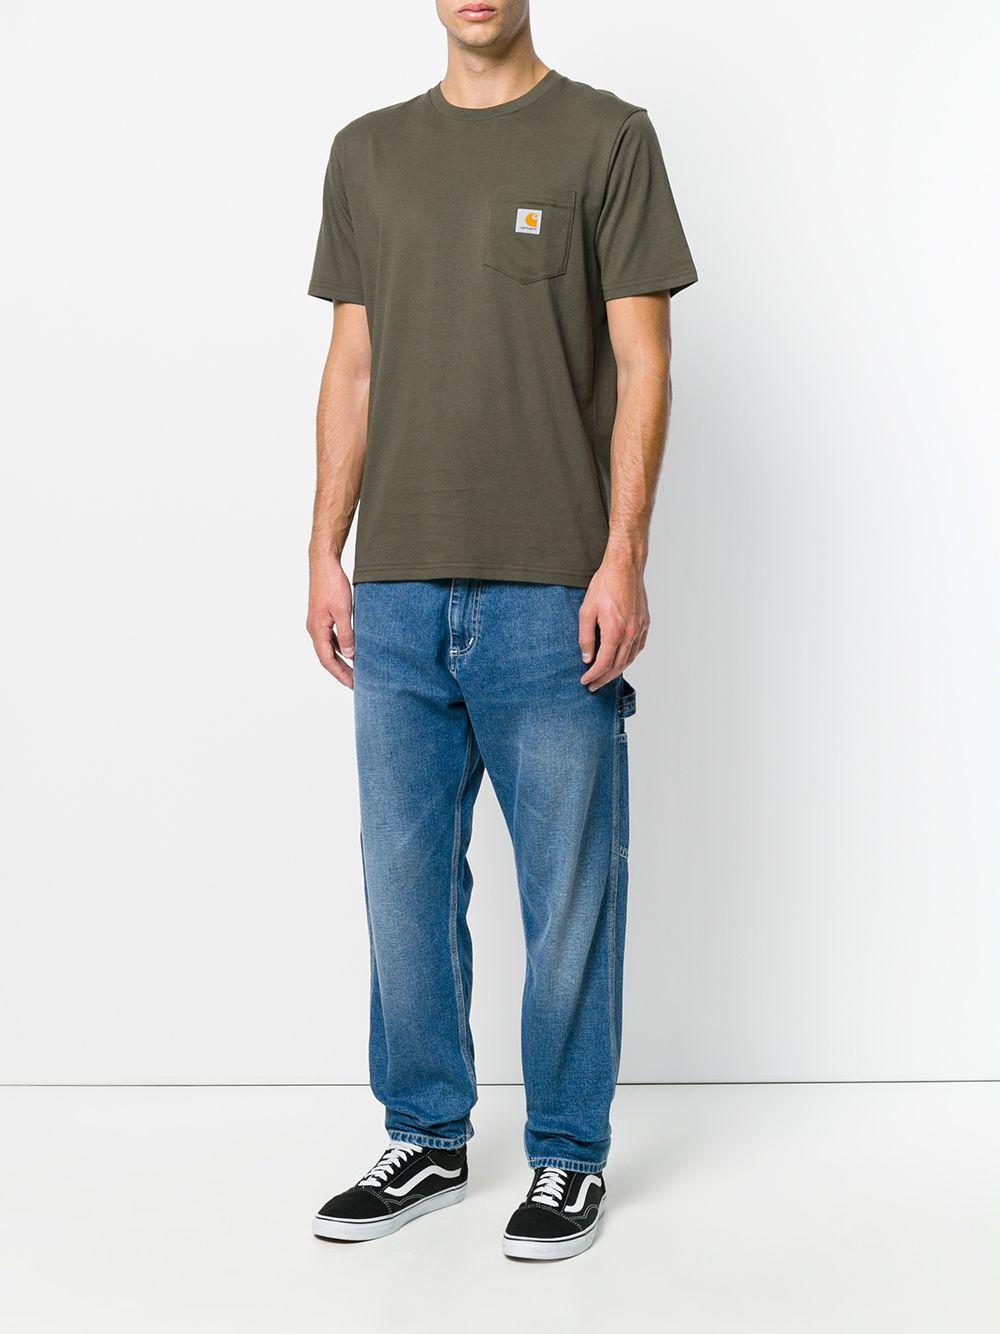 t-shirt taschino uomo cypress in cotone CARHARTT WIP | T-shirt | I02209163.XX